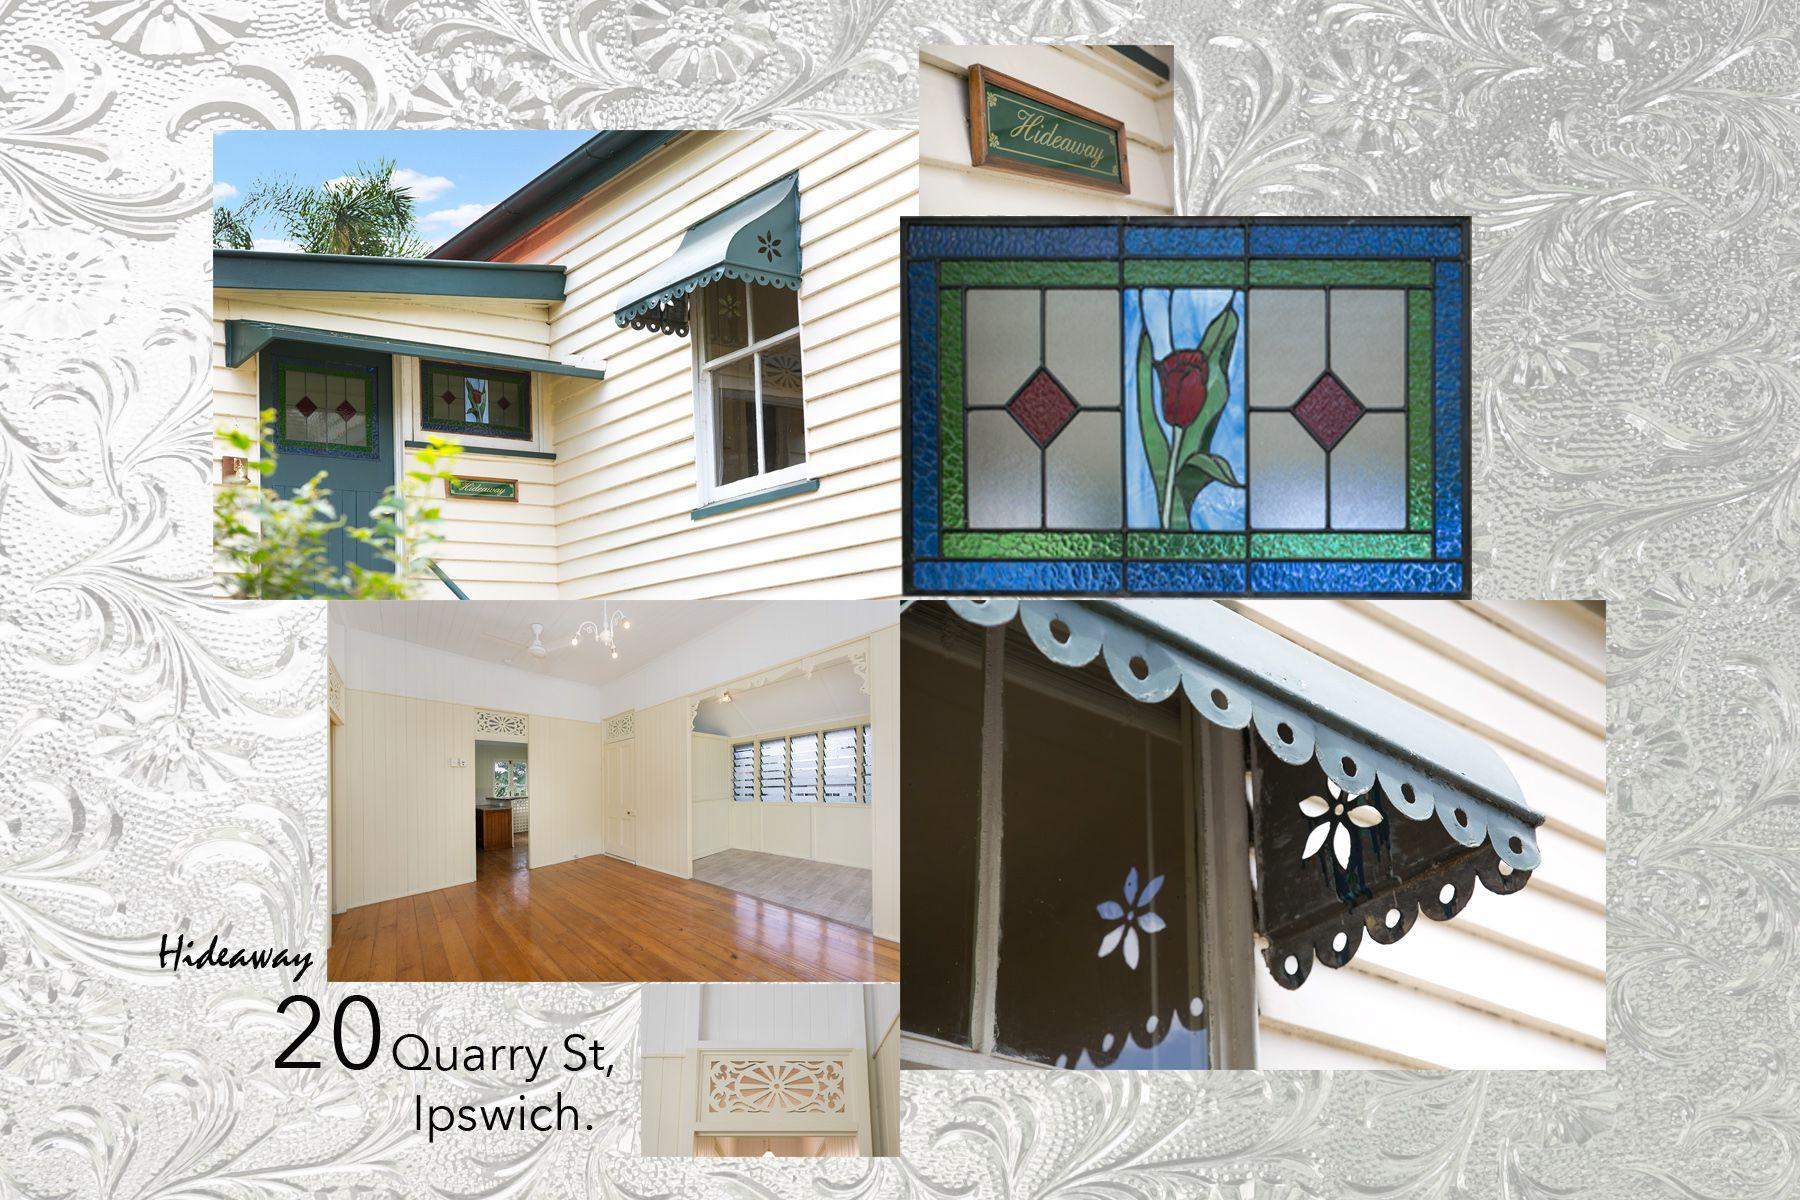 20 Quarry Street, Ipswich, QLD 4305